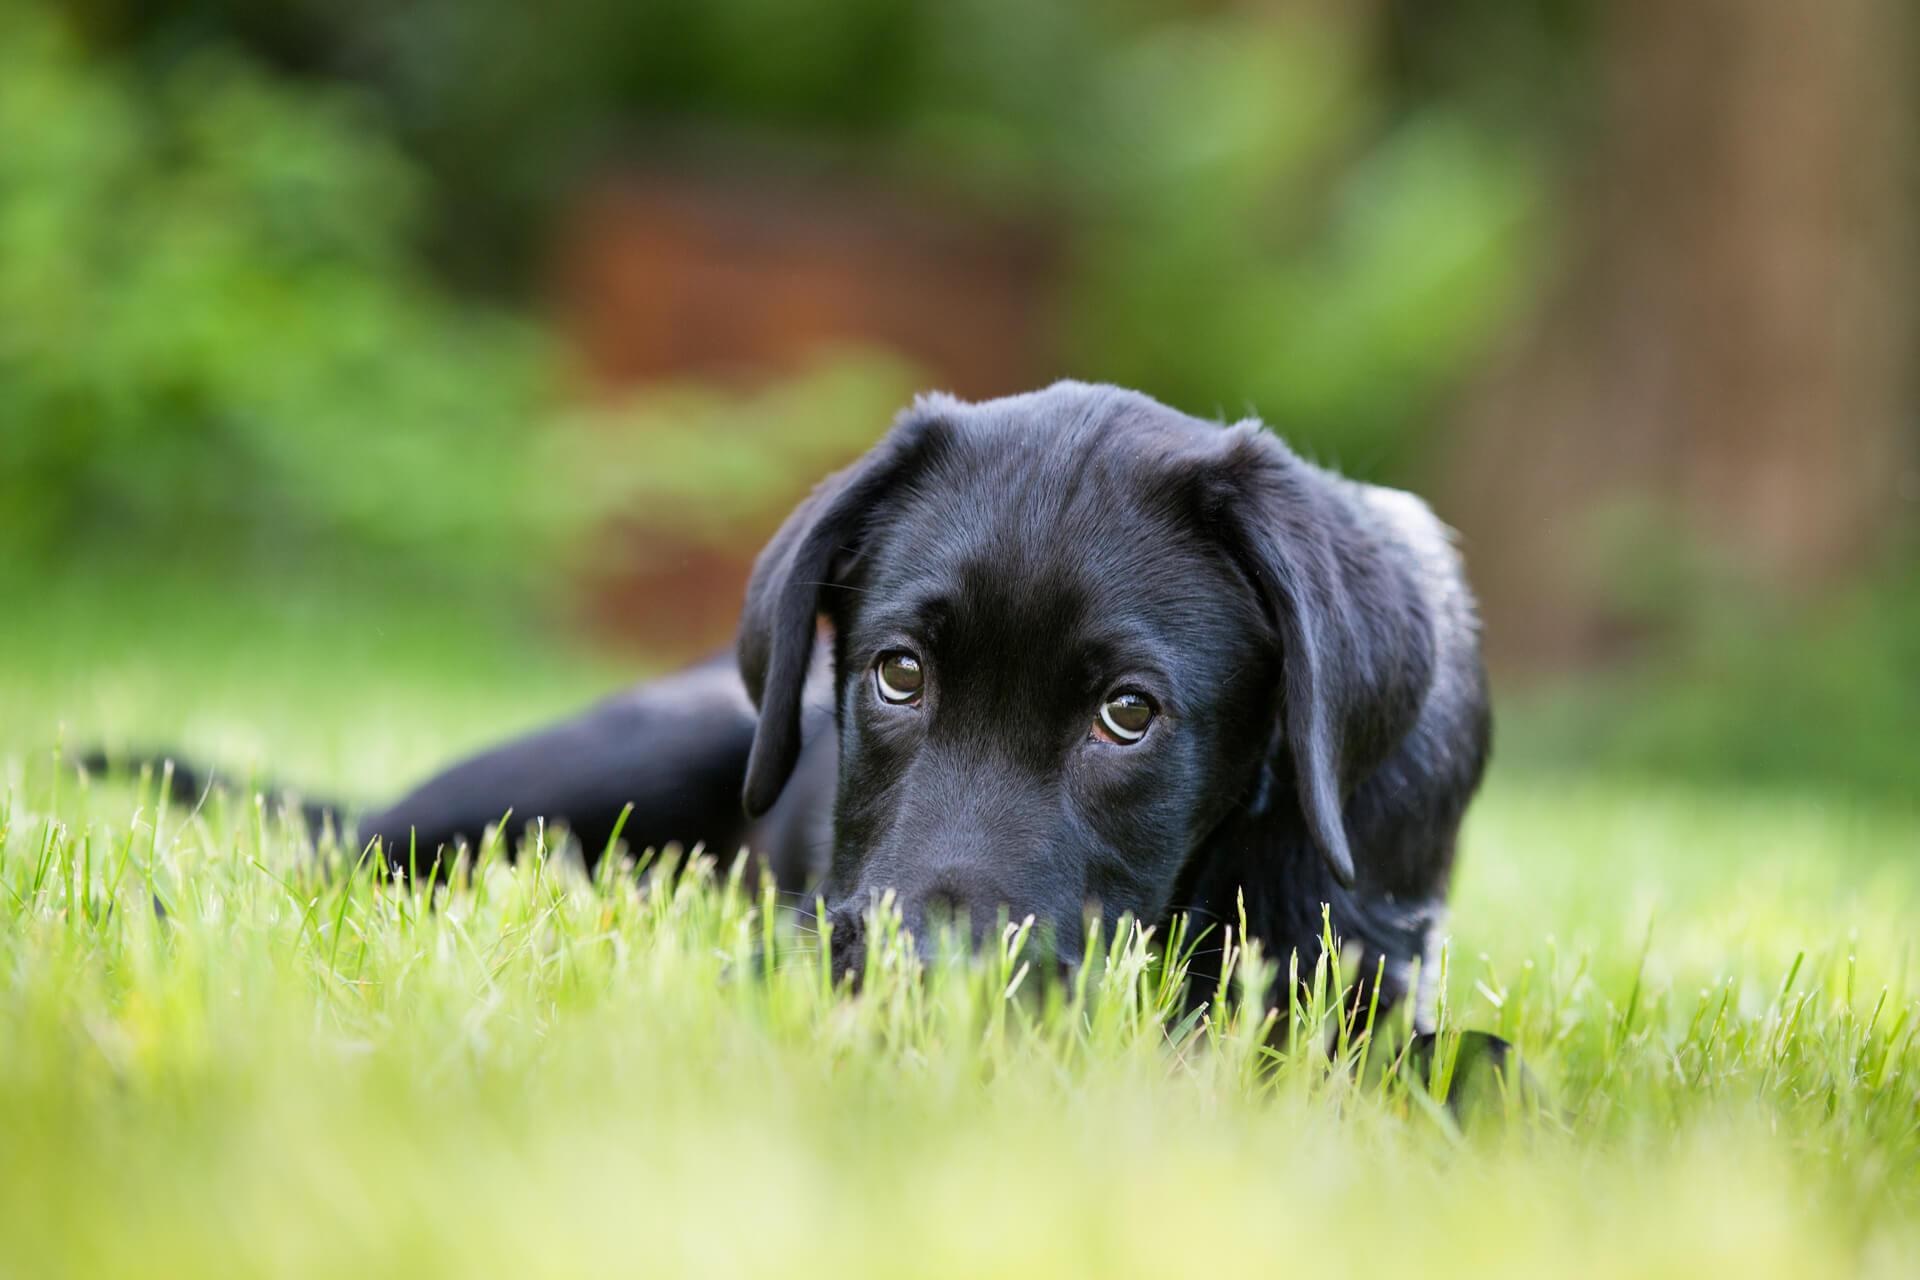 Labrador puppy peering over the grass